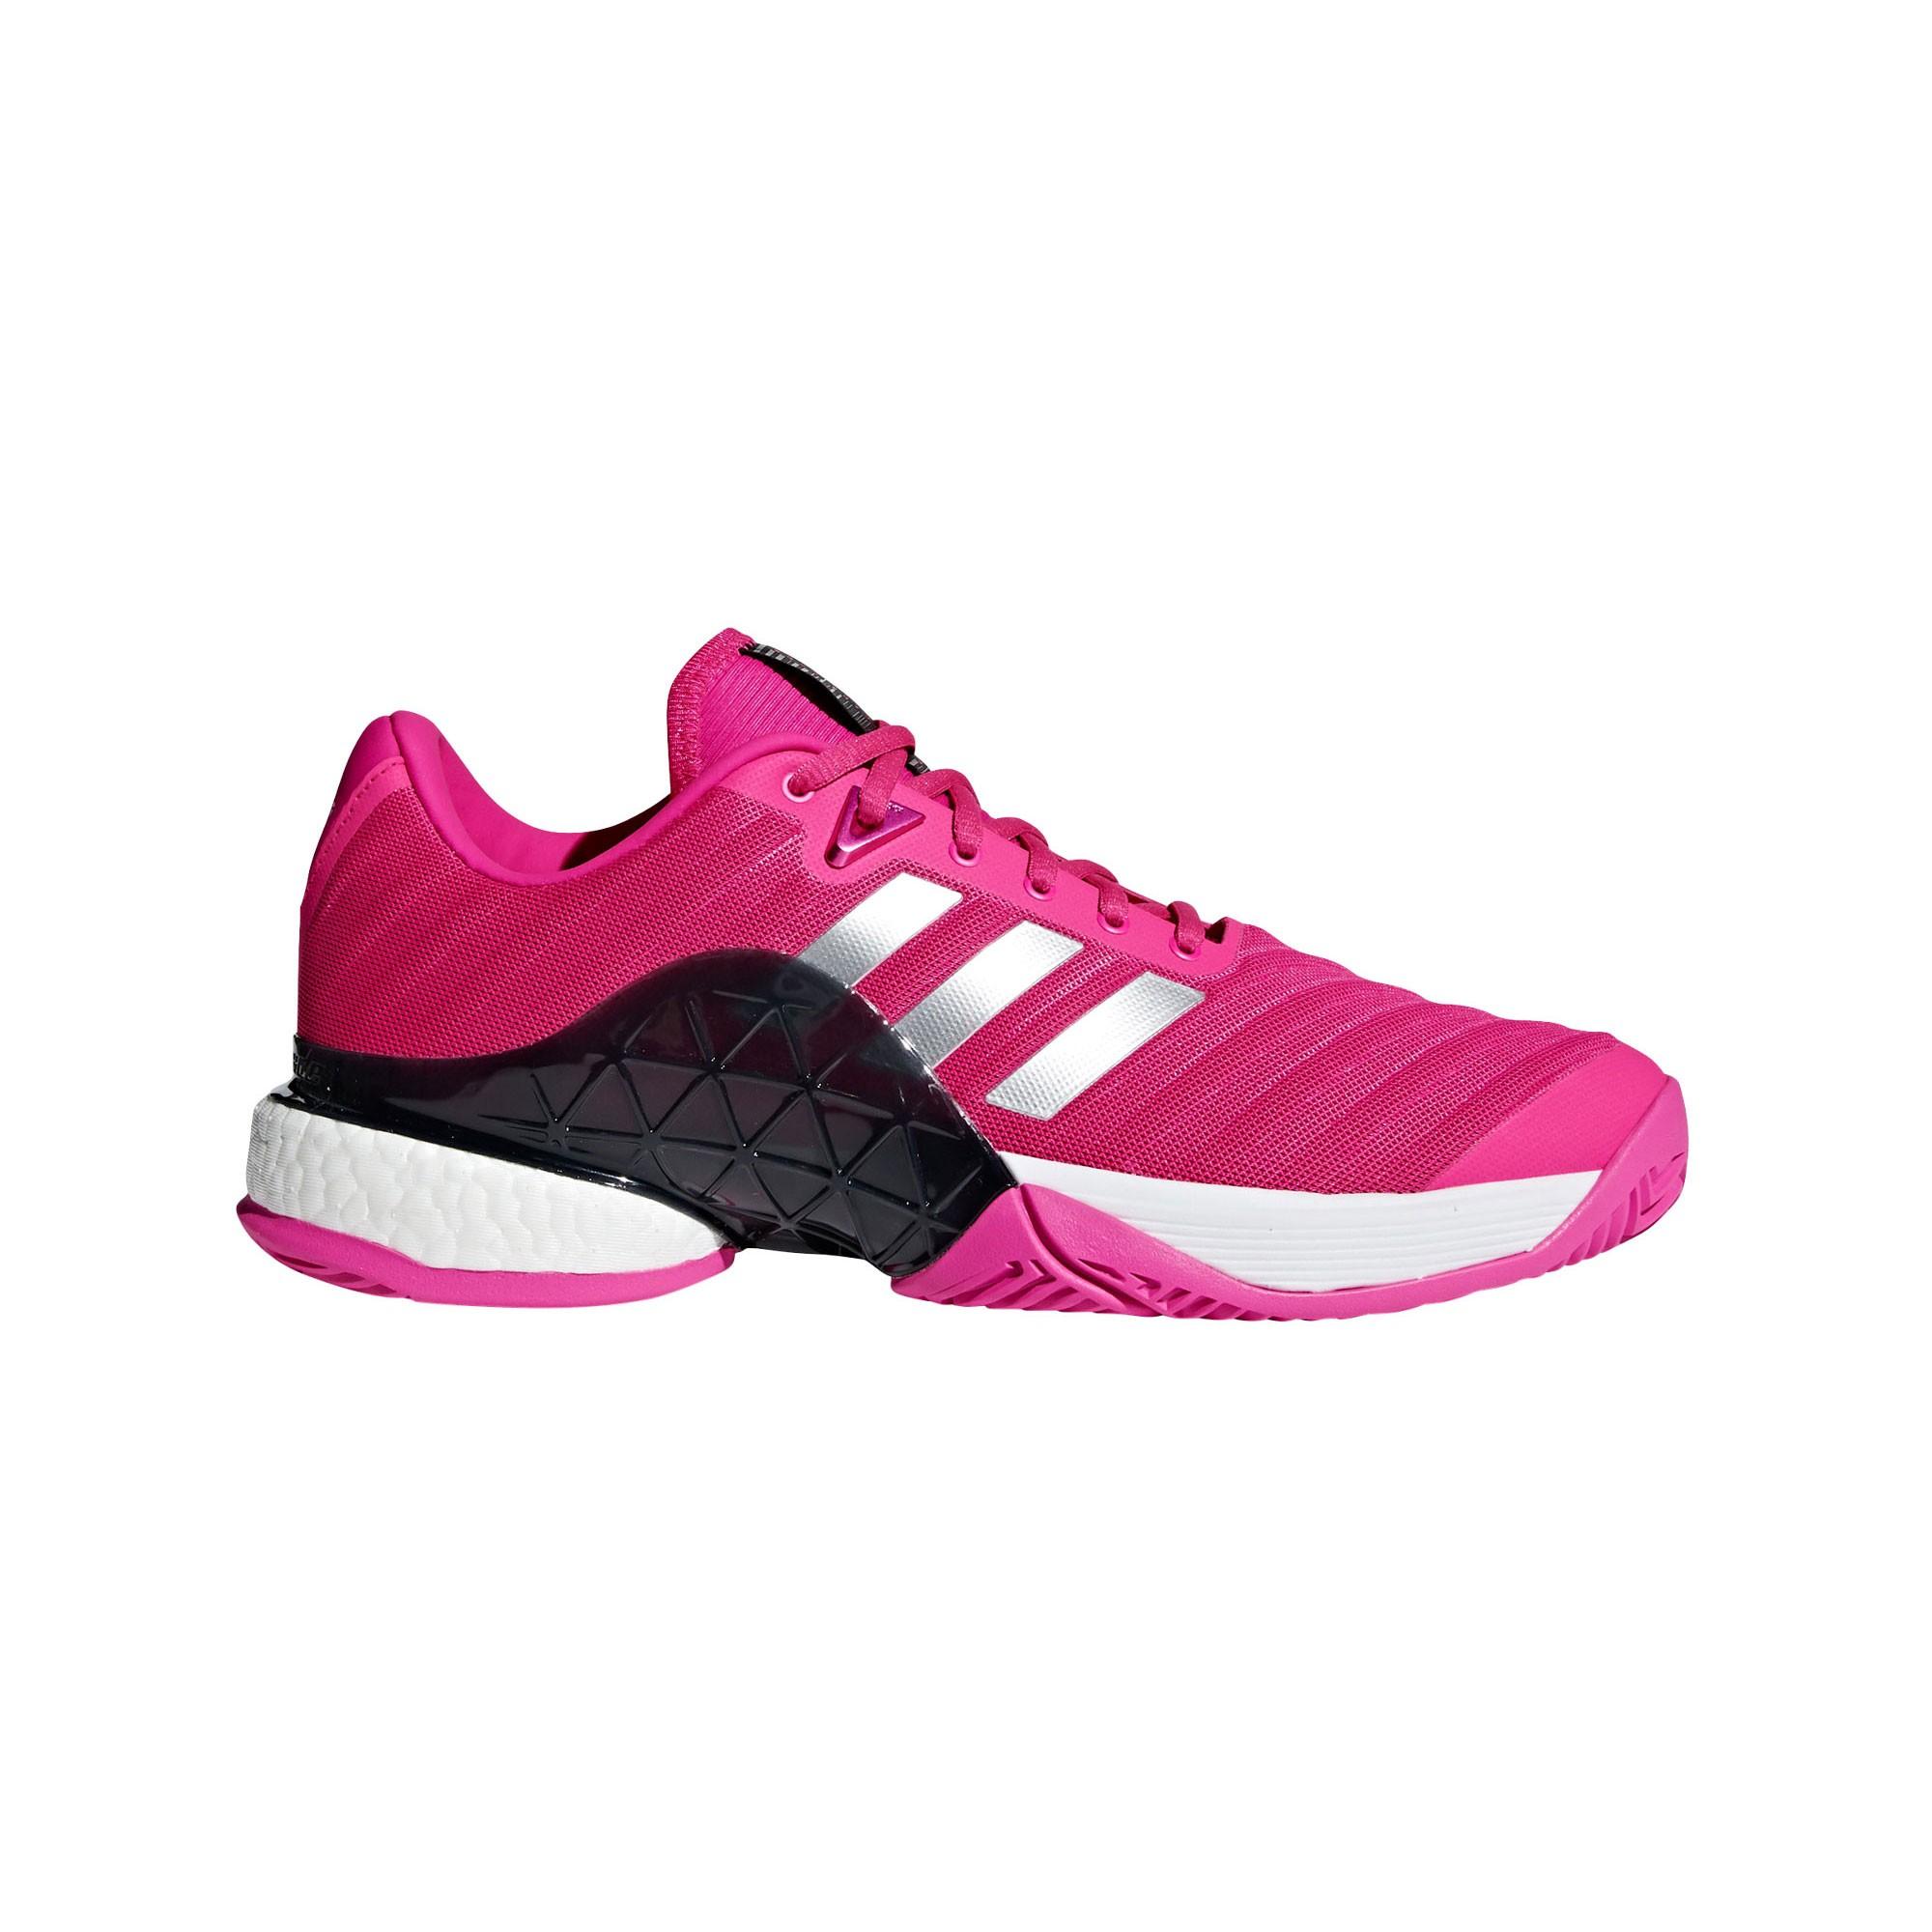 Afbeelding van Adidas Barricade Boost AH2093 Tennisschoenen Heren Shock Pink Matte Silver